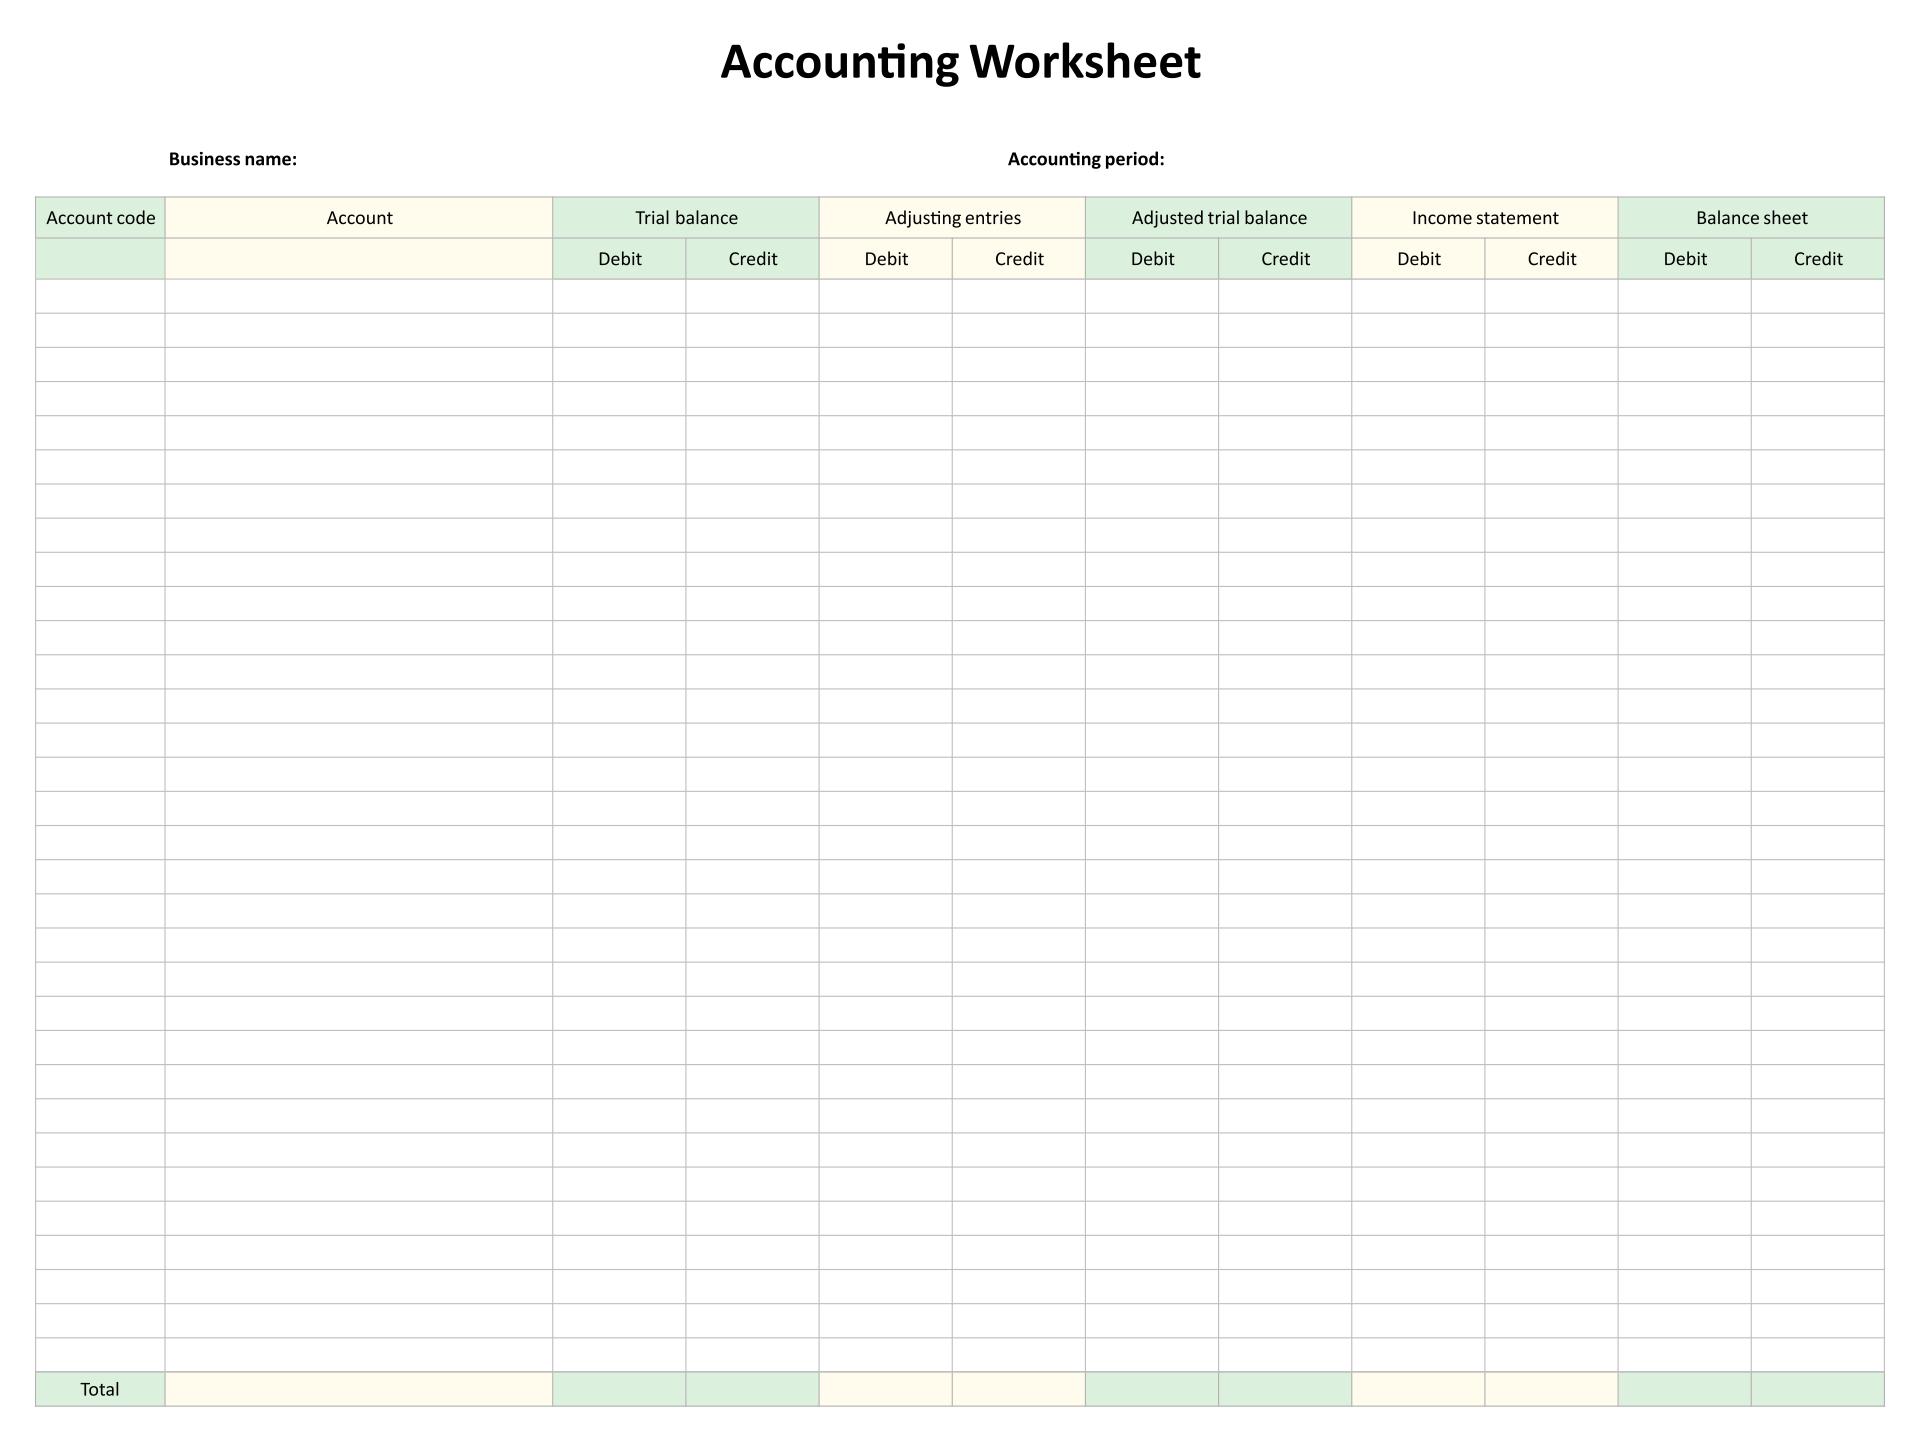 10 Column Accounting Worksheet